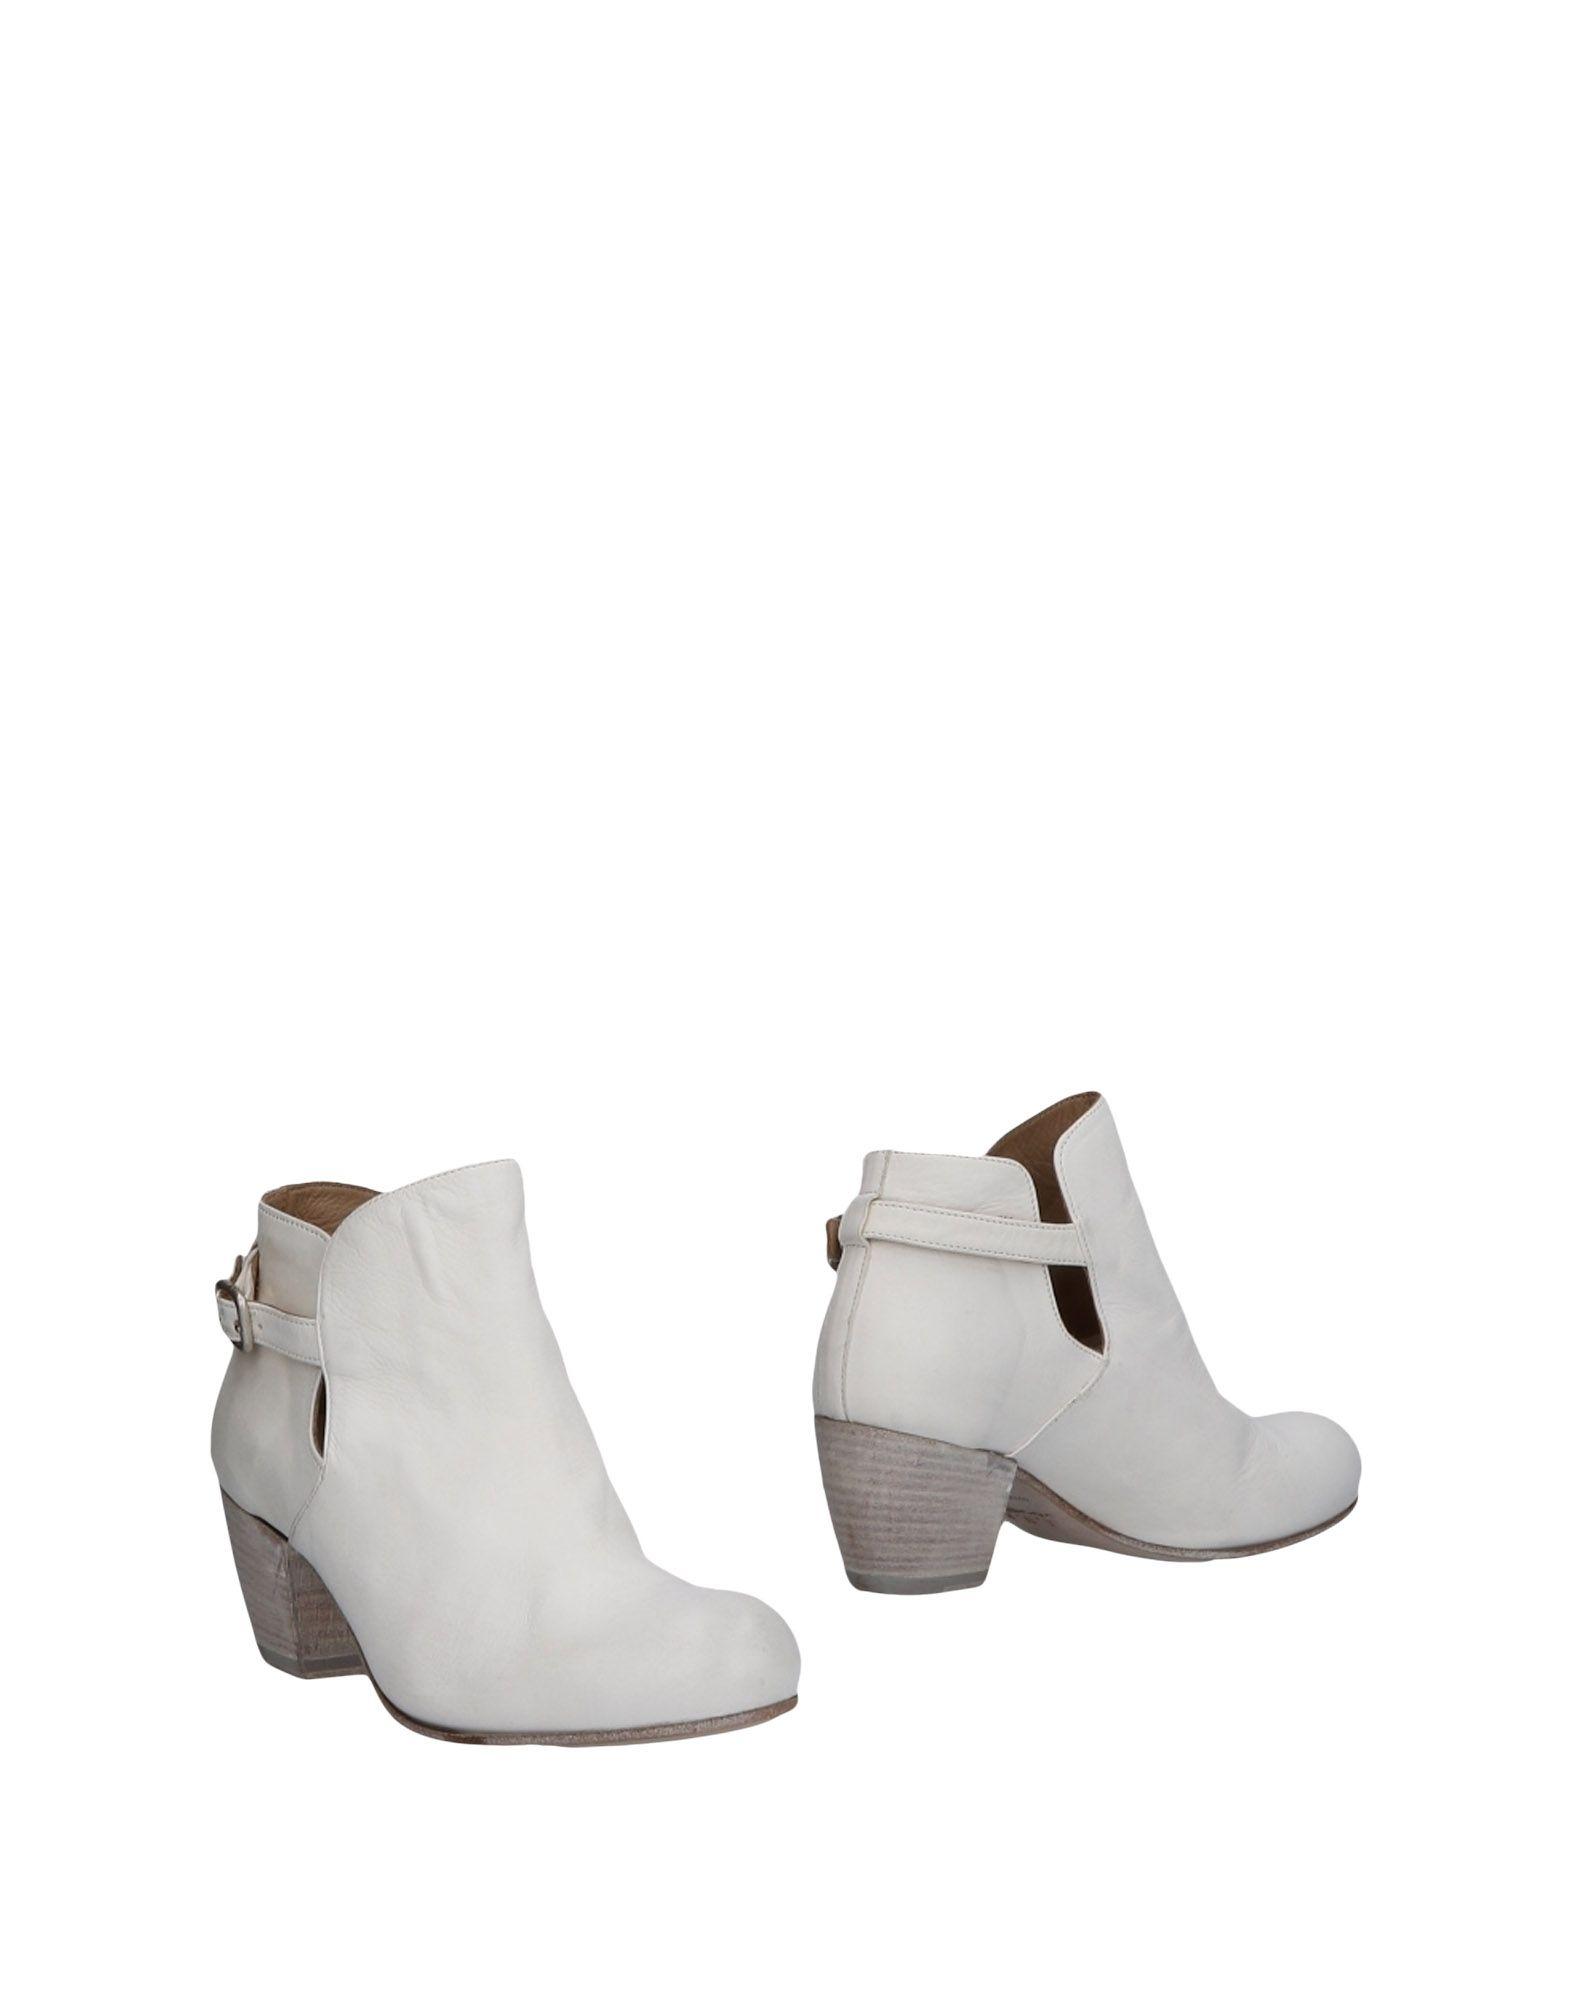 Stilvolle billige Schuhe Damen I.N.K. Shoes Stiefelette Damen Schuhe  11475609HV f951f4